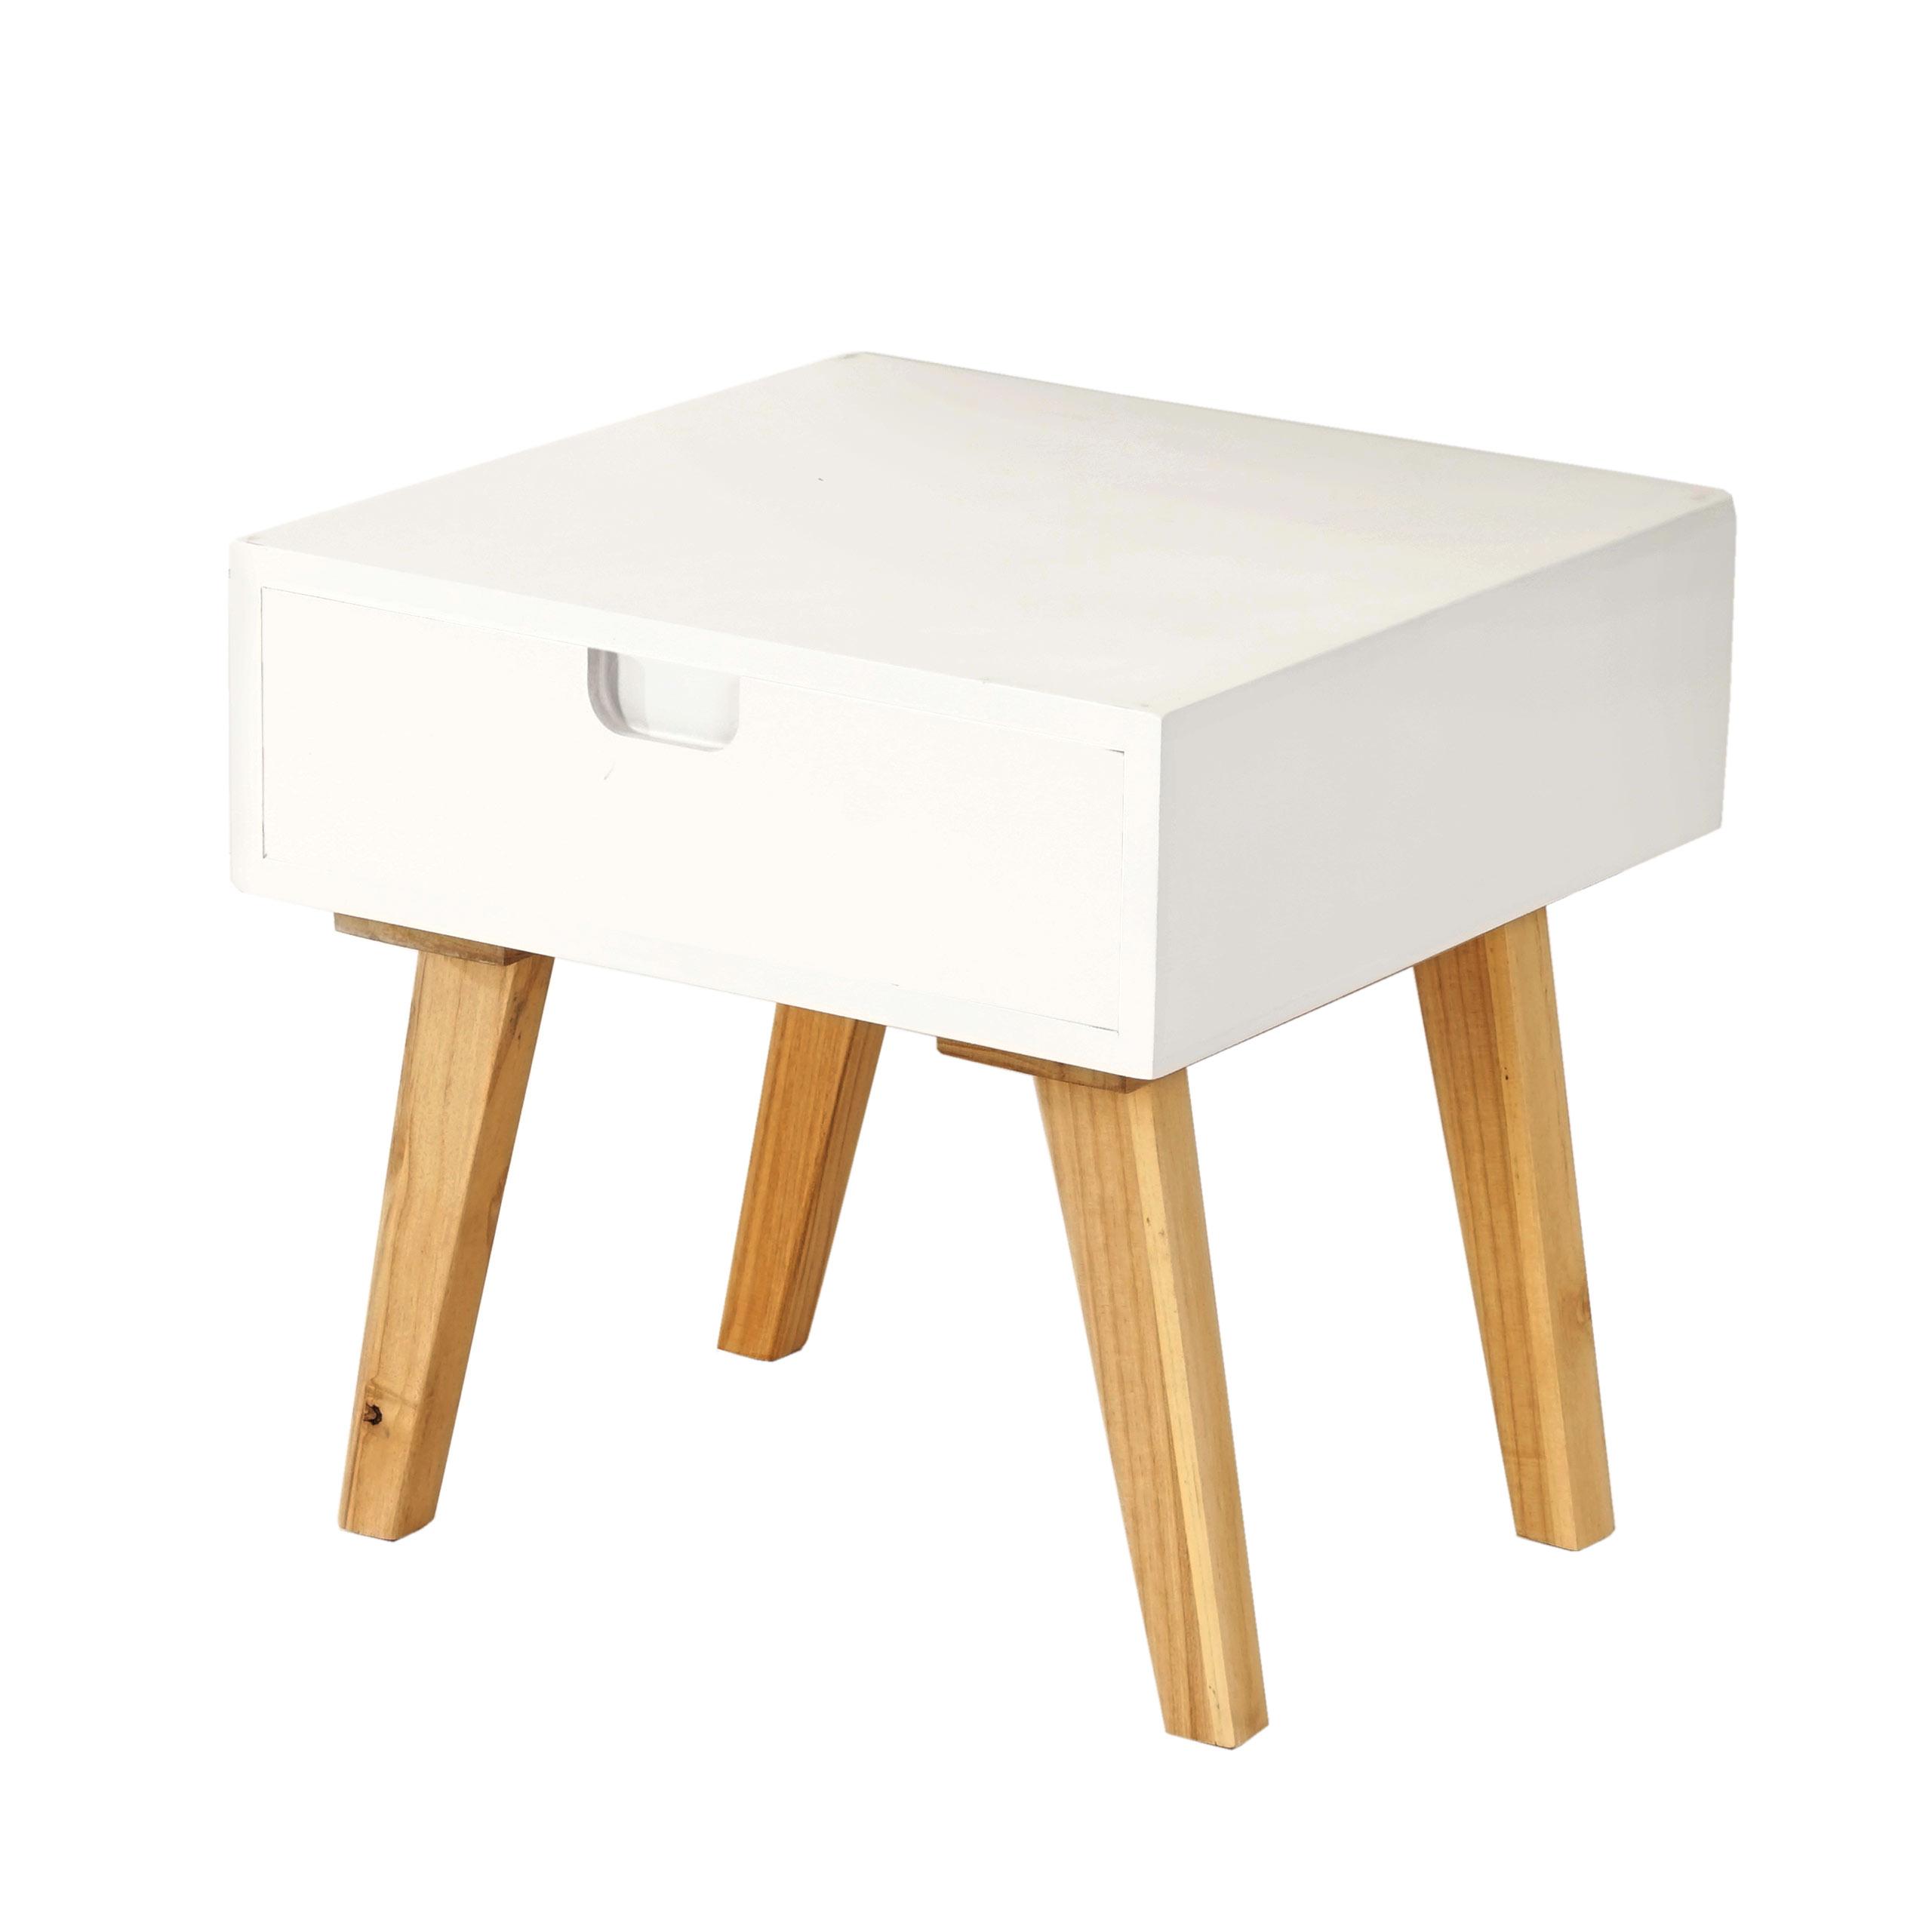 kommode malm t255 beistelltisch schrank retro design 40x40x40cm wei e front. Black Bedroom Furniture Sets. Home Design Ideas